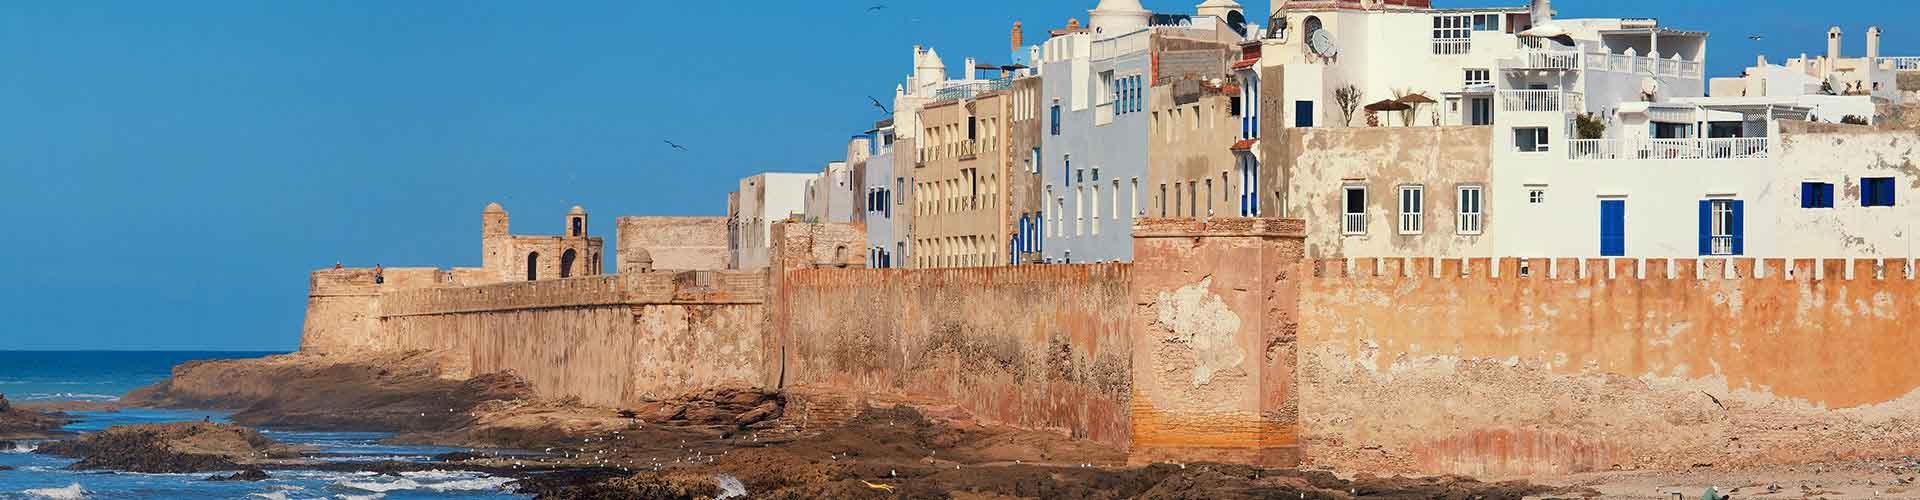 Essaouira - Auberges de jeunesse à Essaouira. Cartes pour Essaouira, photos et commentaires pour chaque auberge de jeunesse à Essaouira.